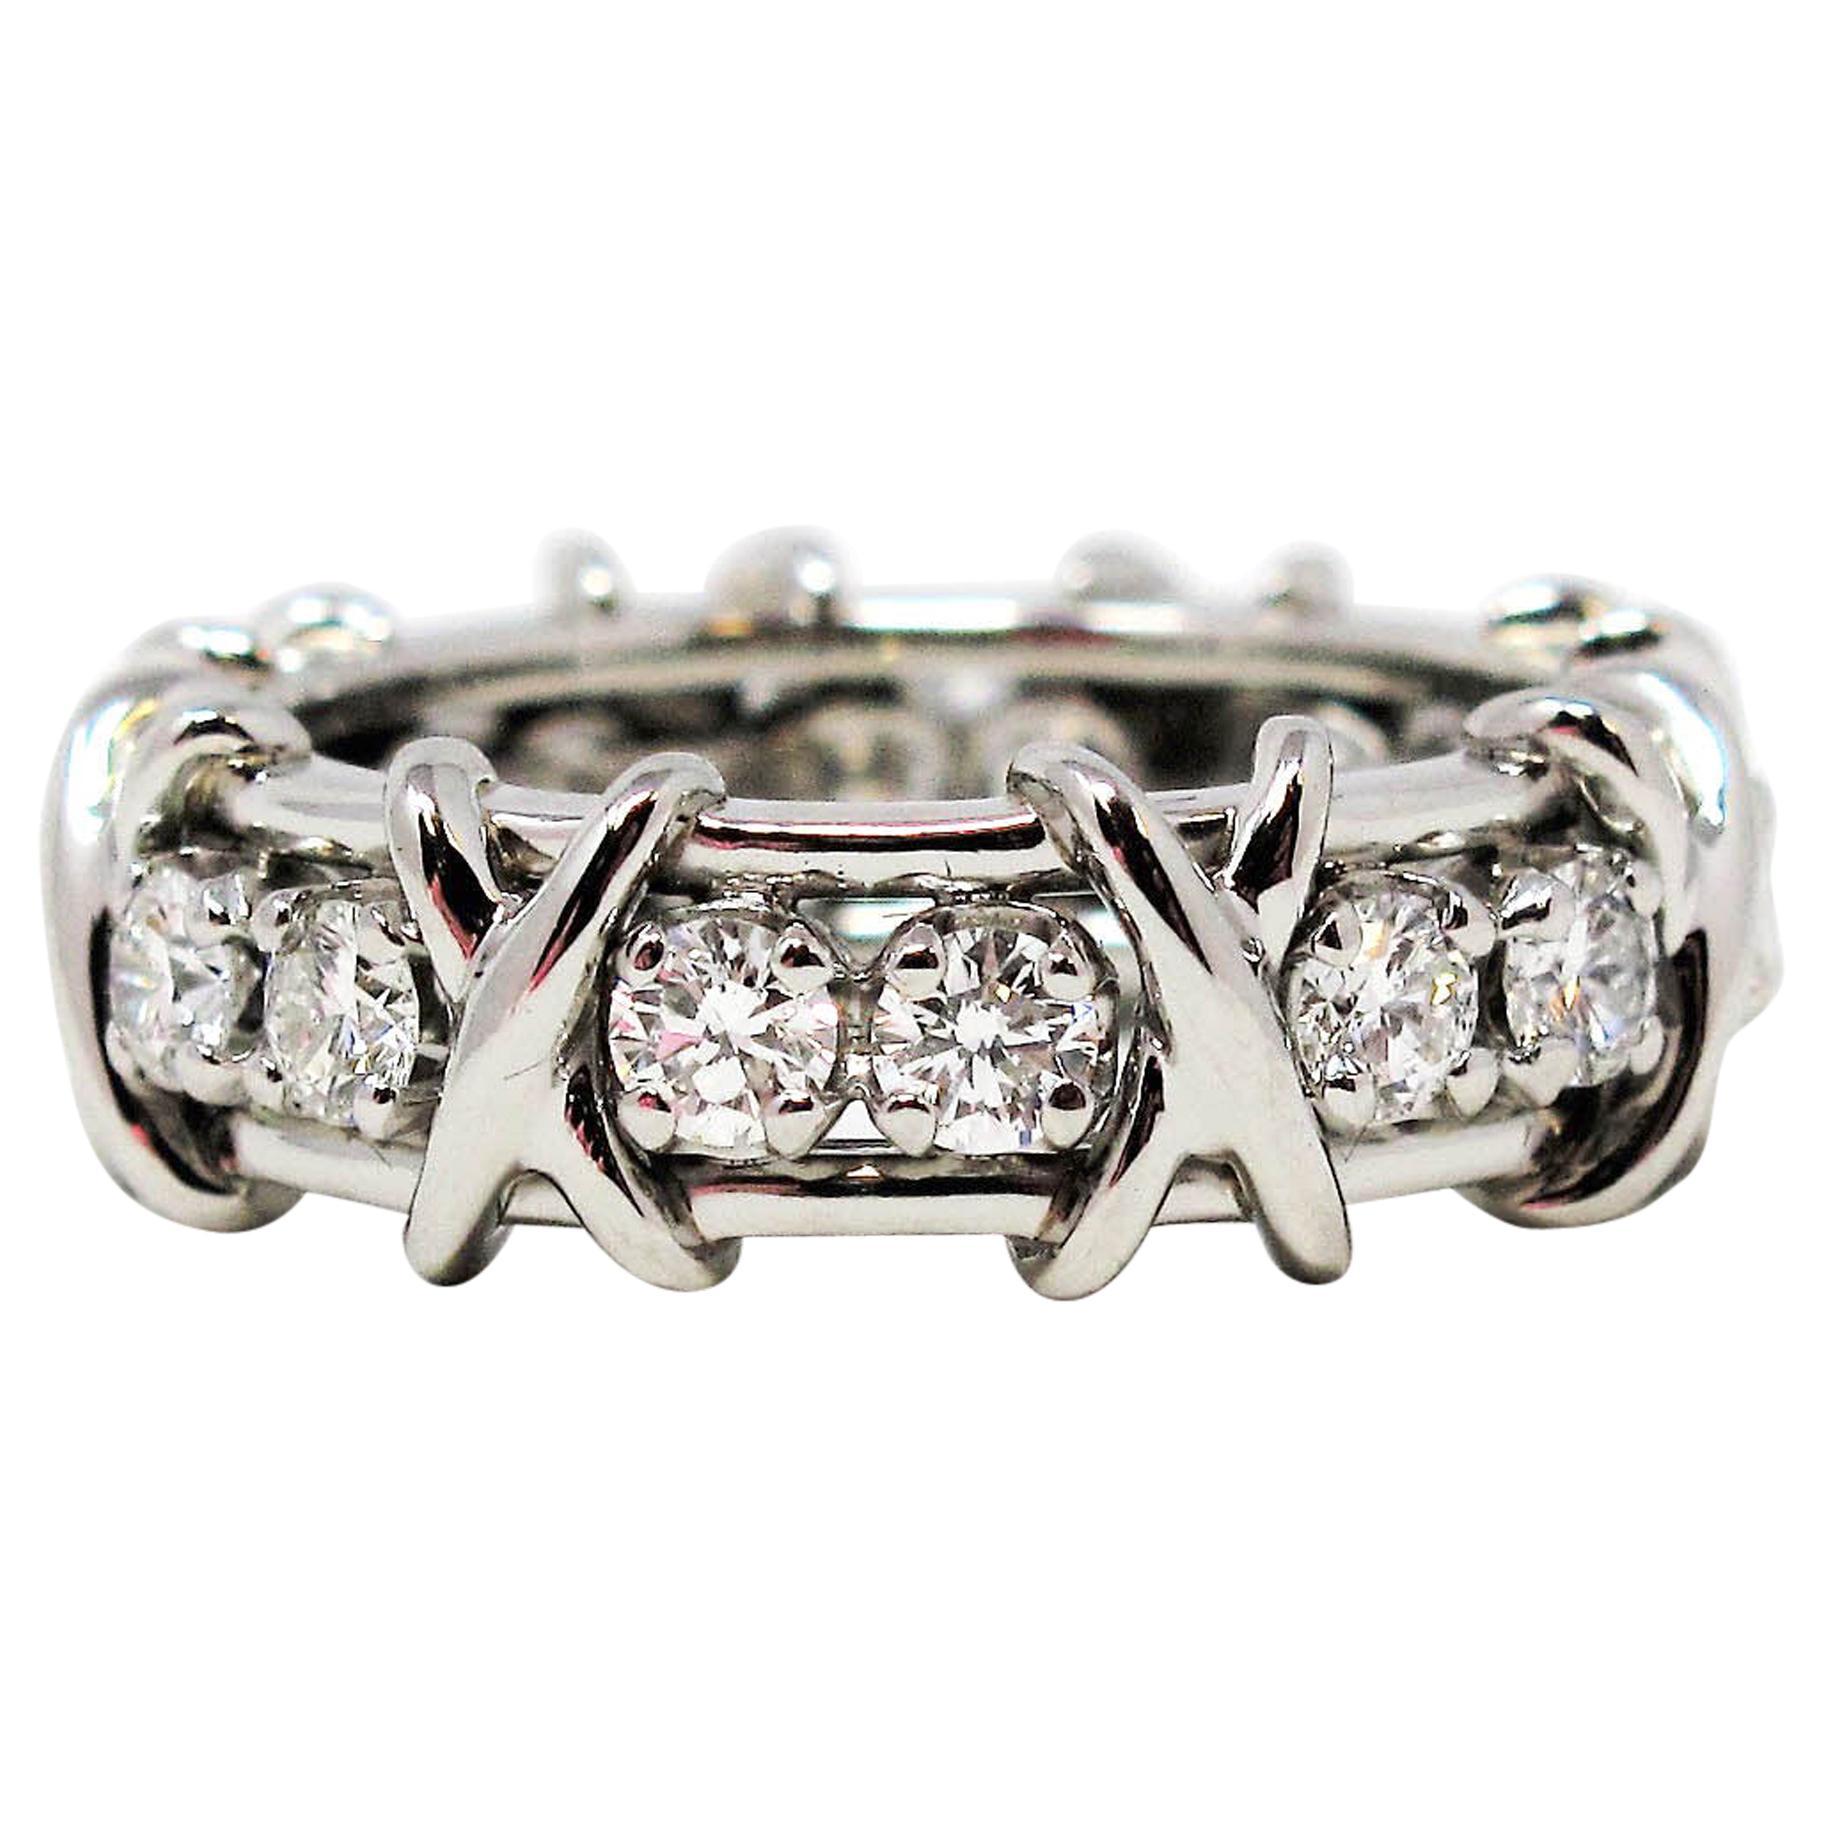 Tiffany & Co. Schlumberger Diamond Sixteen-Stone Platinum Band Ring Size 6